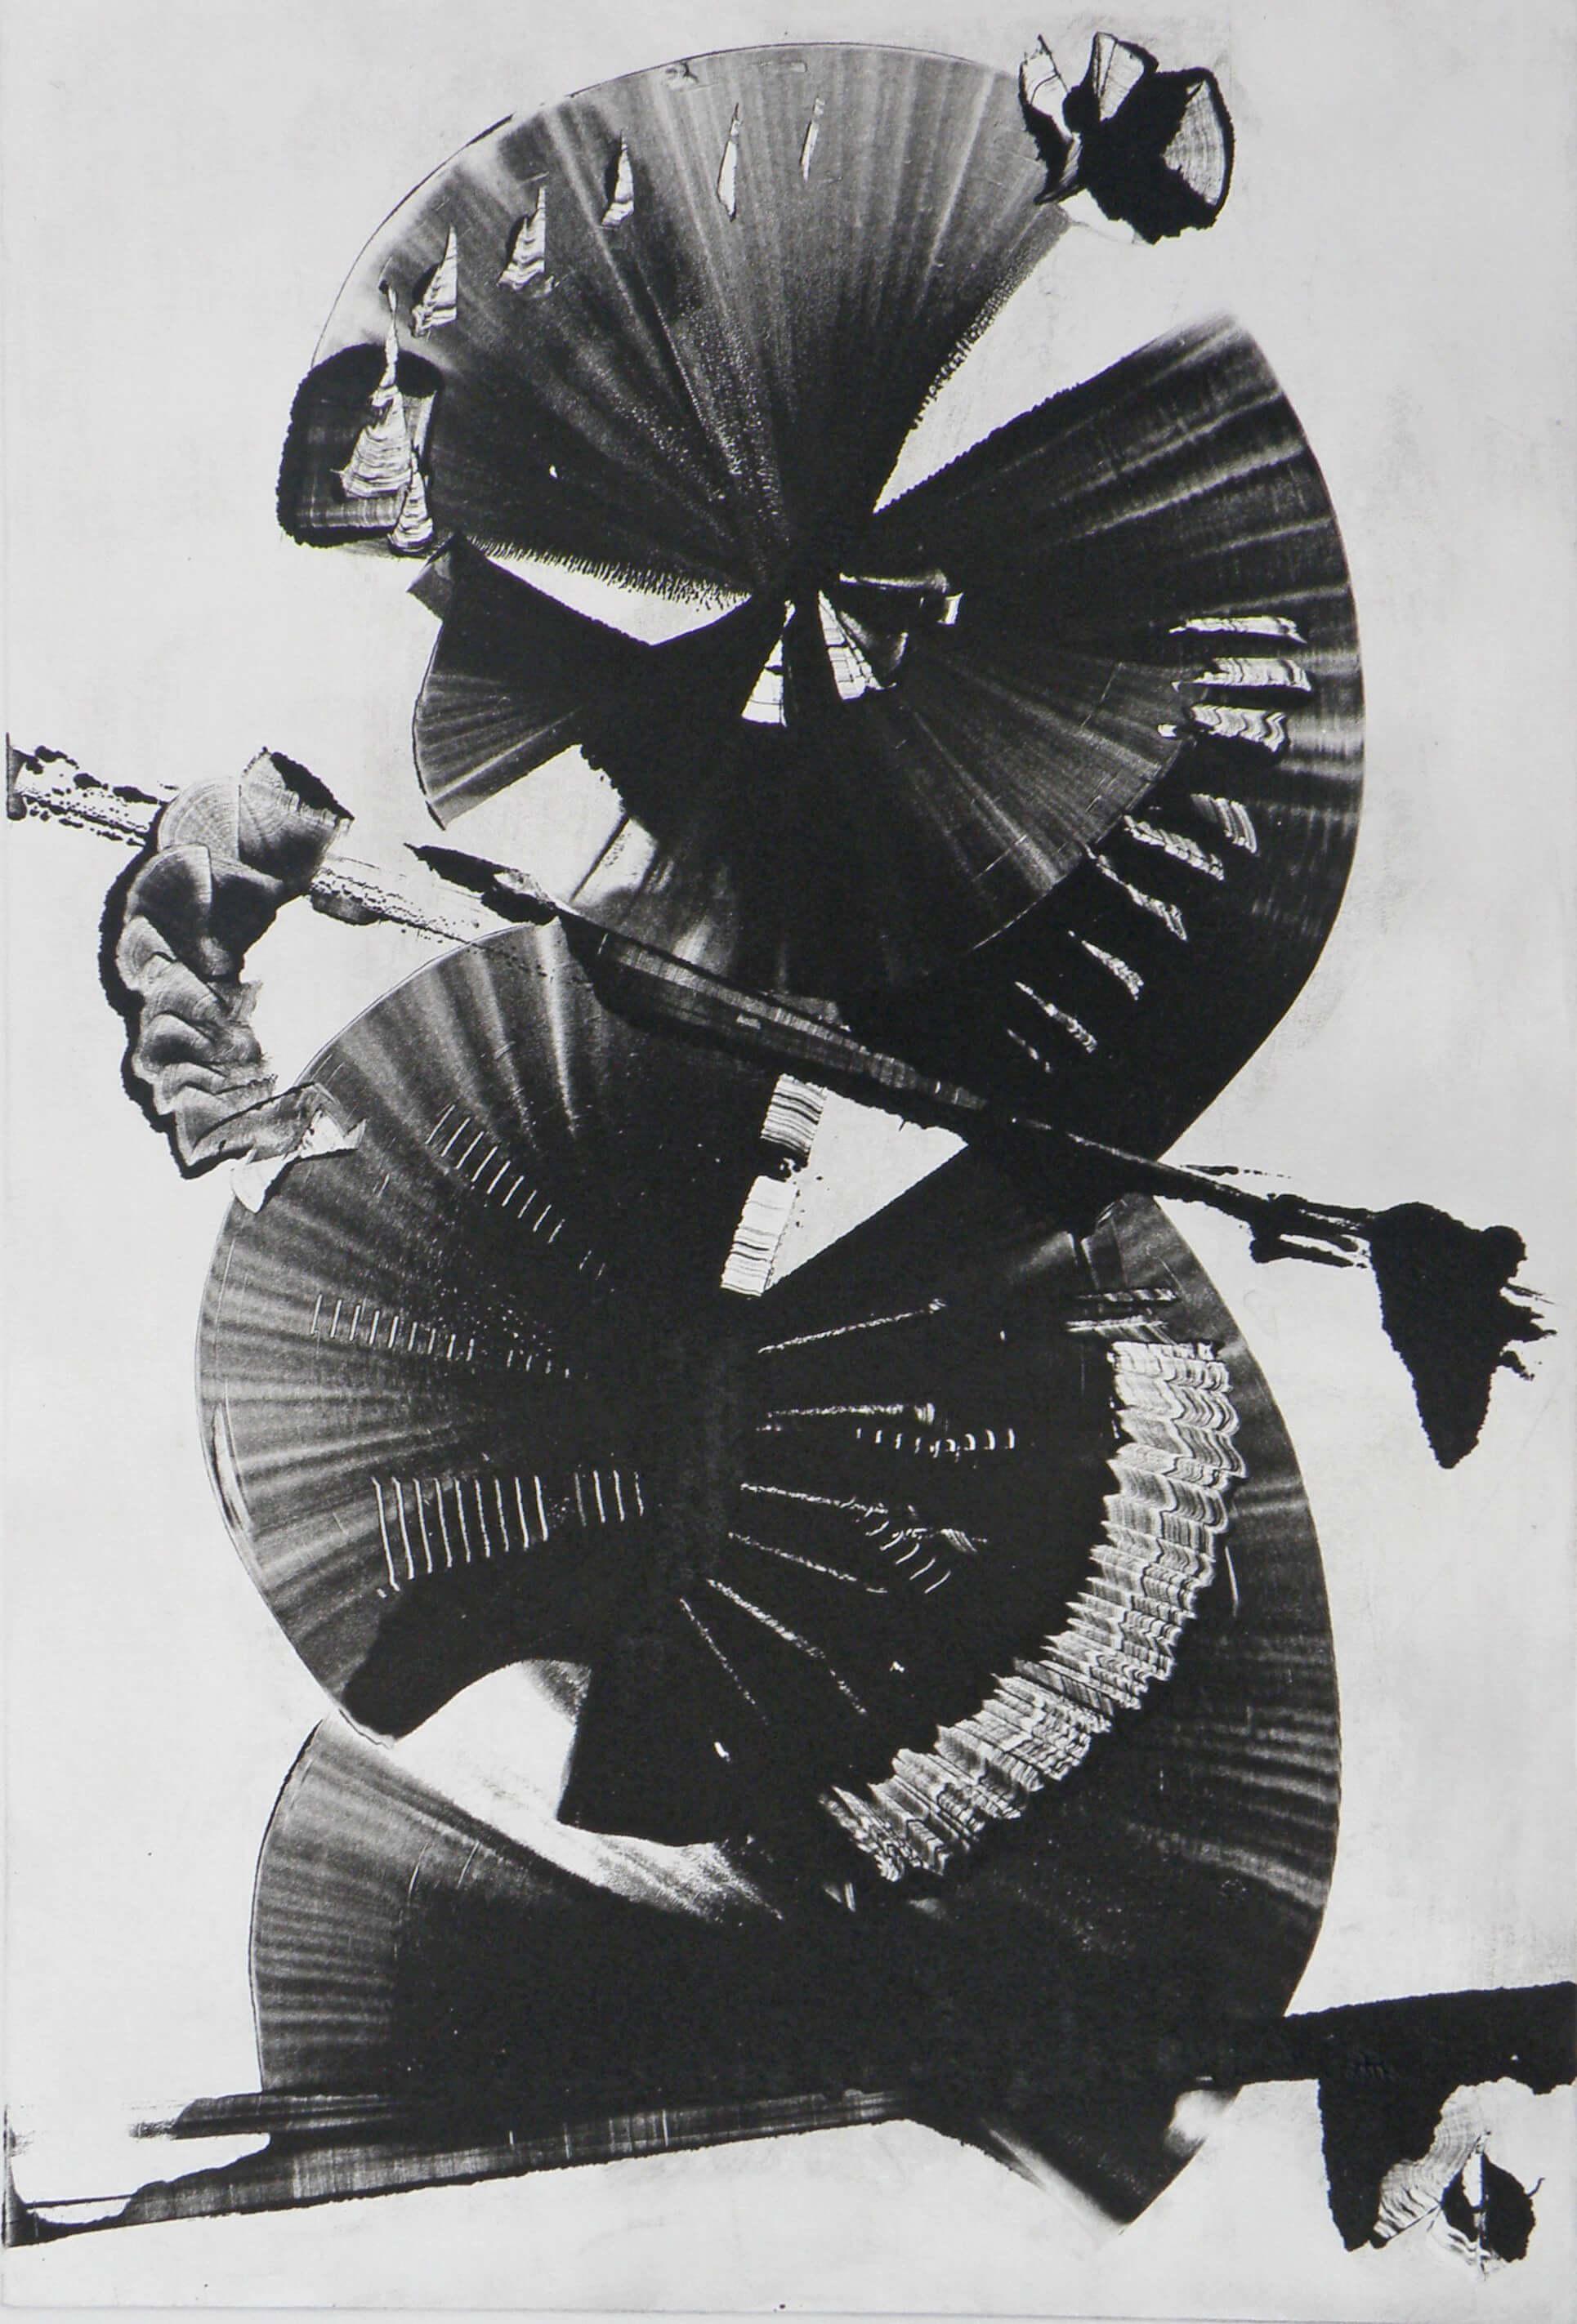 Estampes - Gérard Tournay - Mouvement